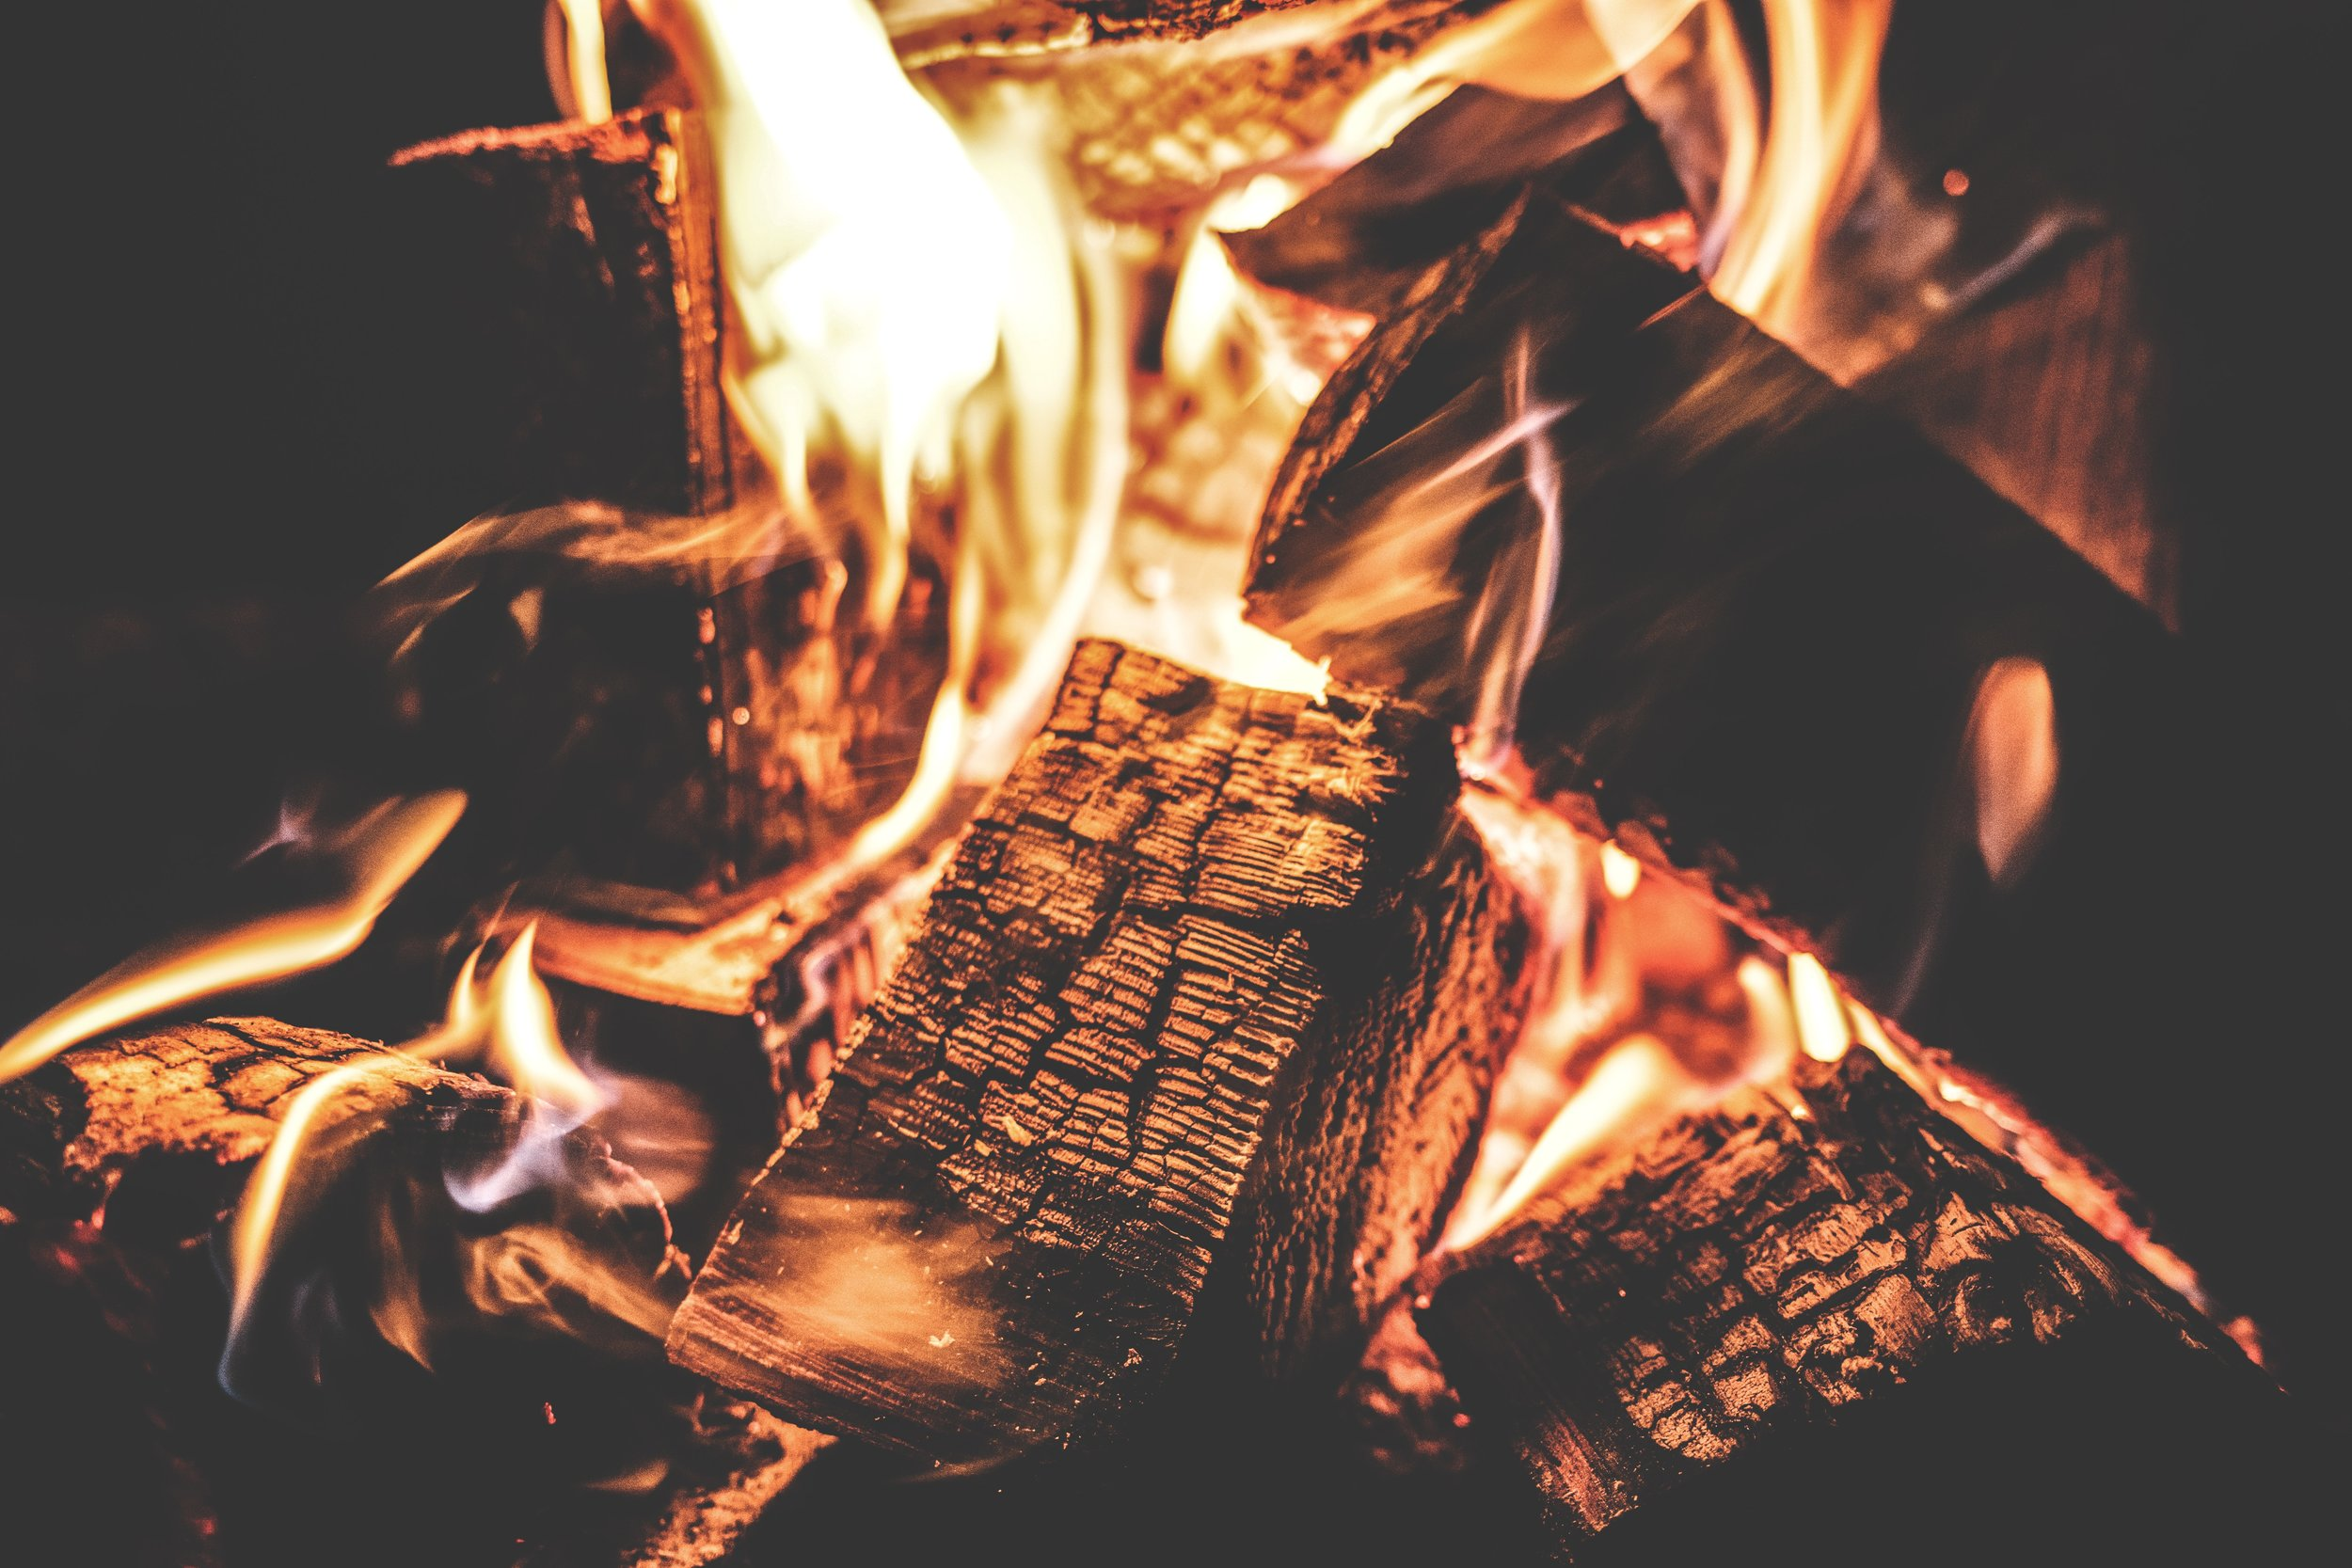 amber-bonfire-burn-167701.jpg